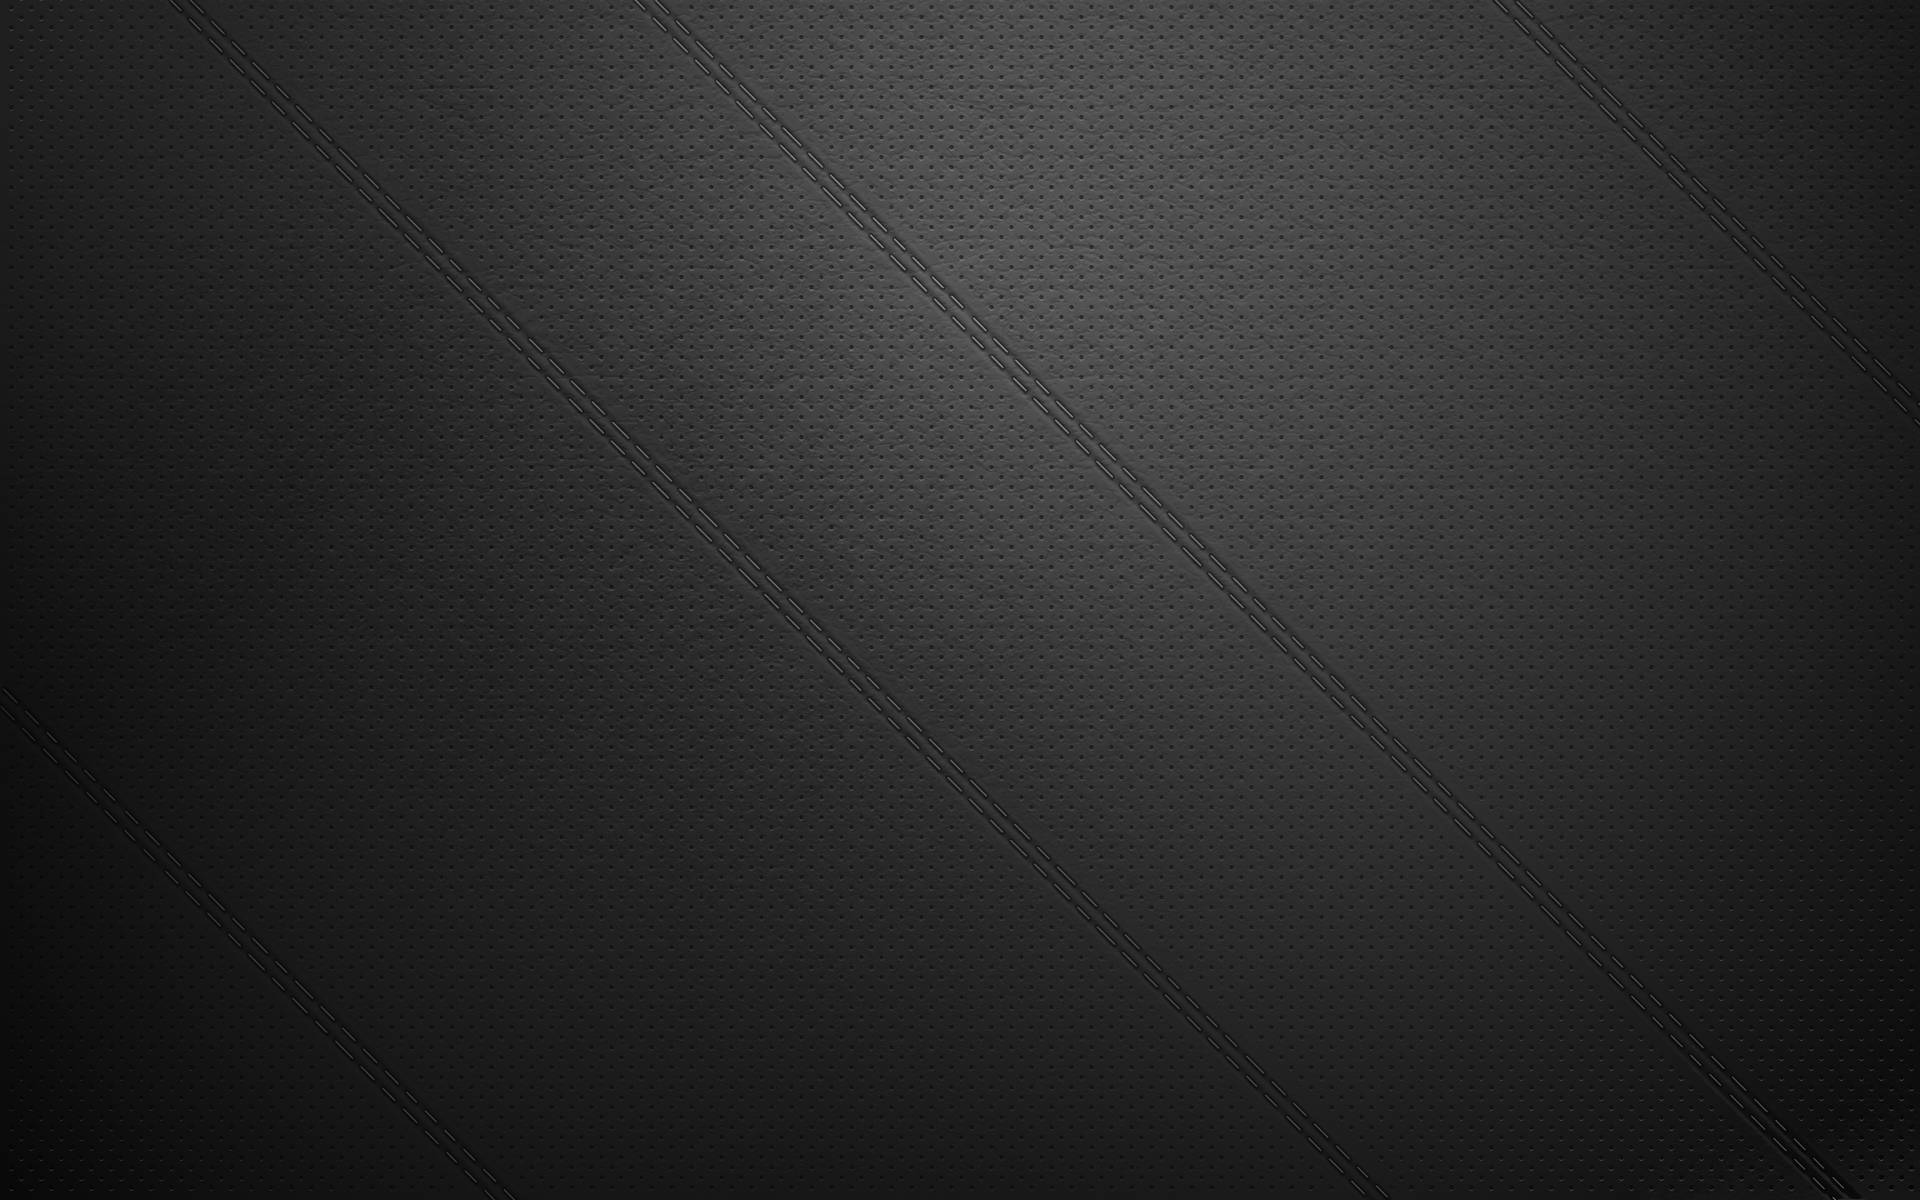 Ubuntu Dark Blue Abstract Wallpaper 6994 Hd Wallpapers Background 1920x1200